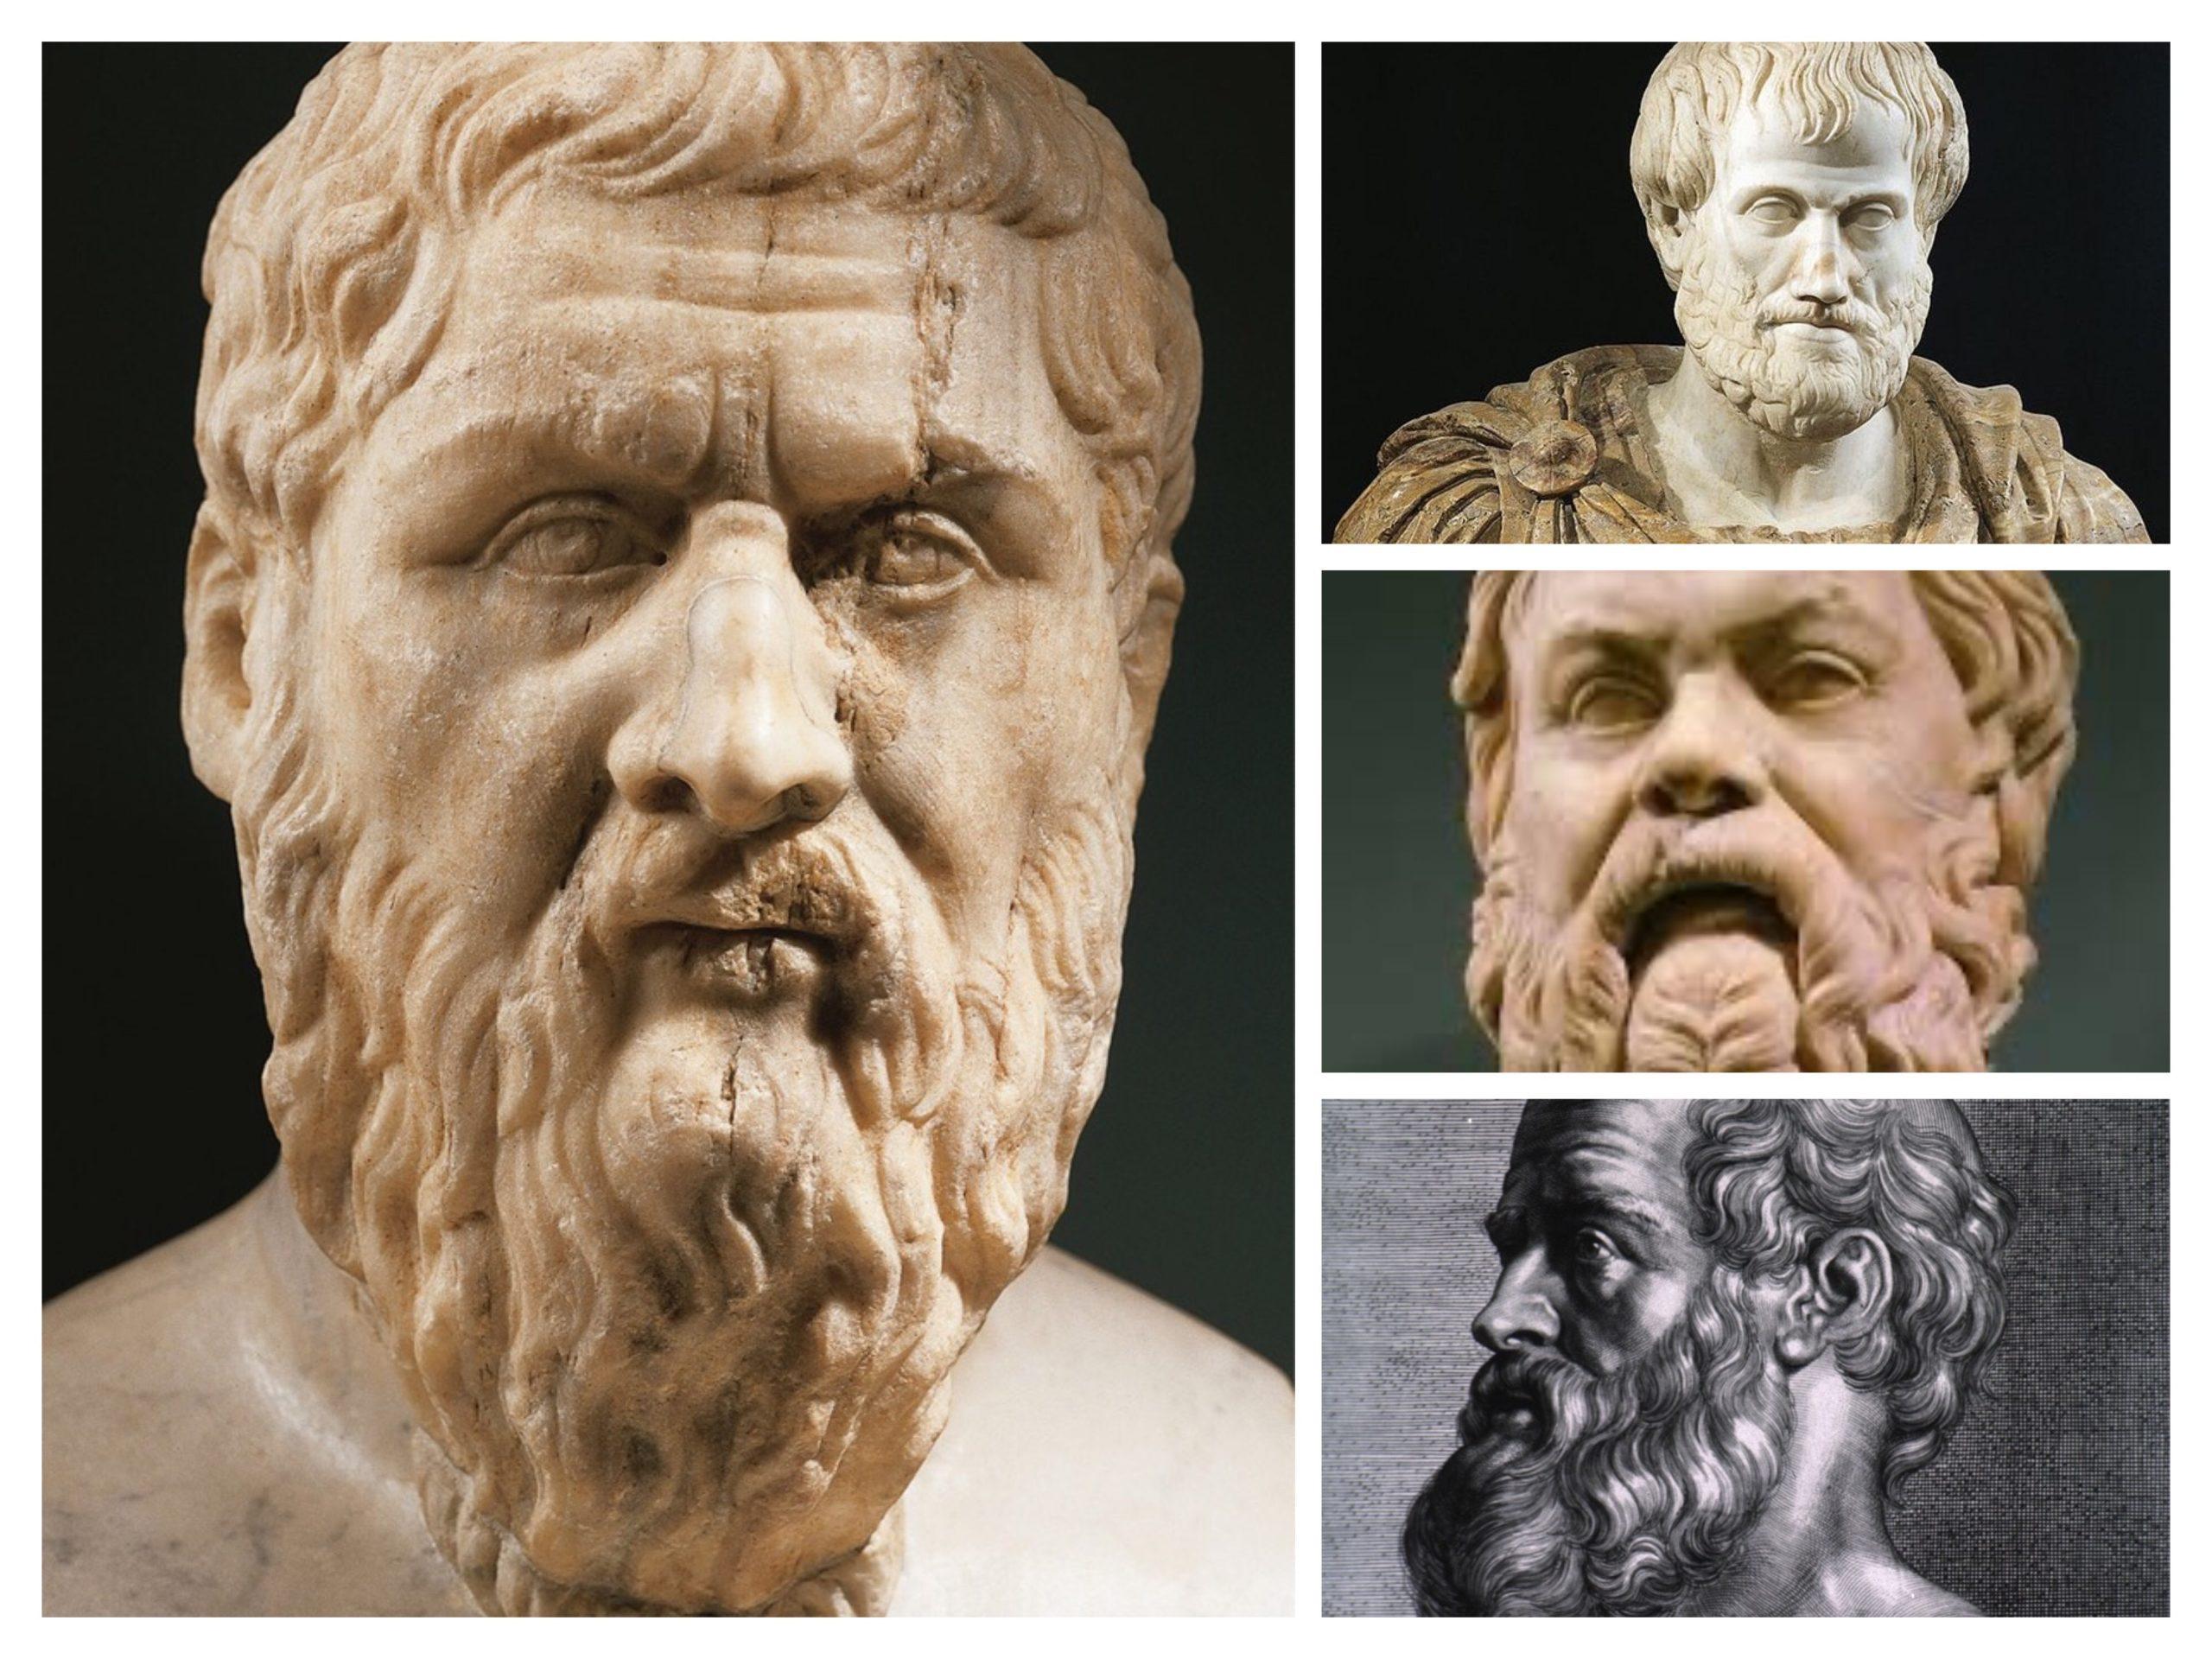 مطالعه فلسفه و منطق-فلاسفه جهان